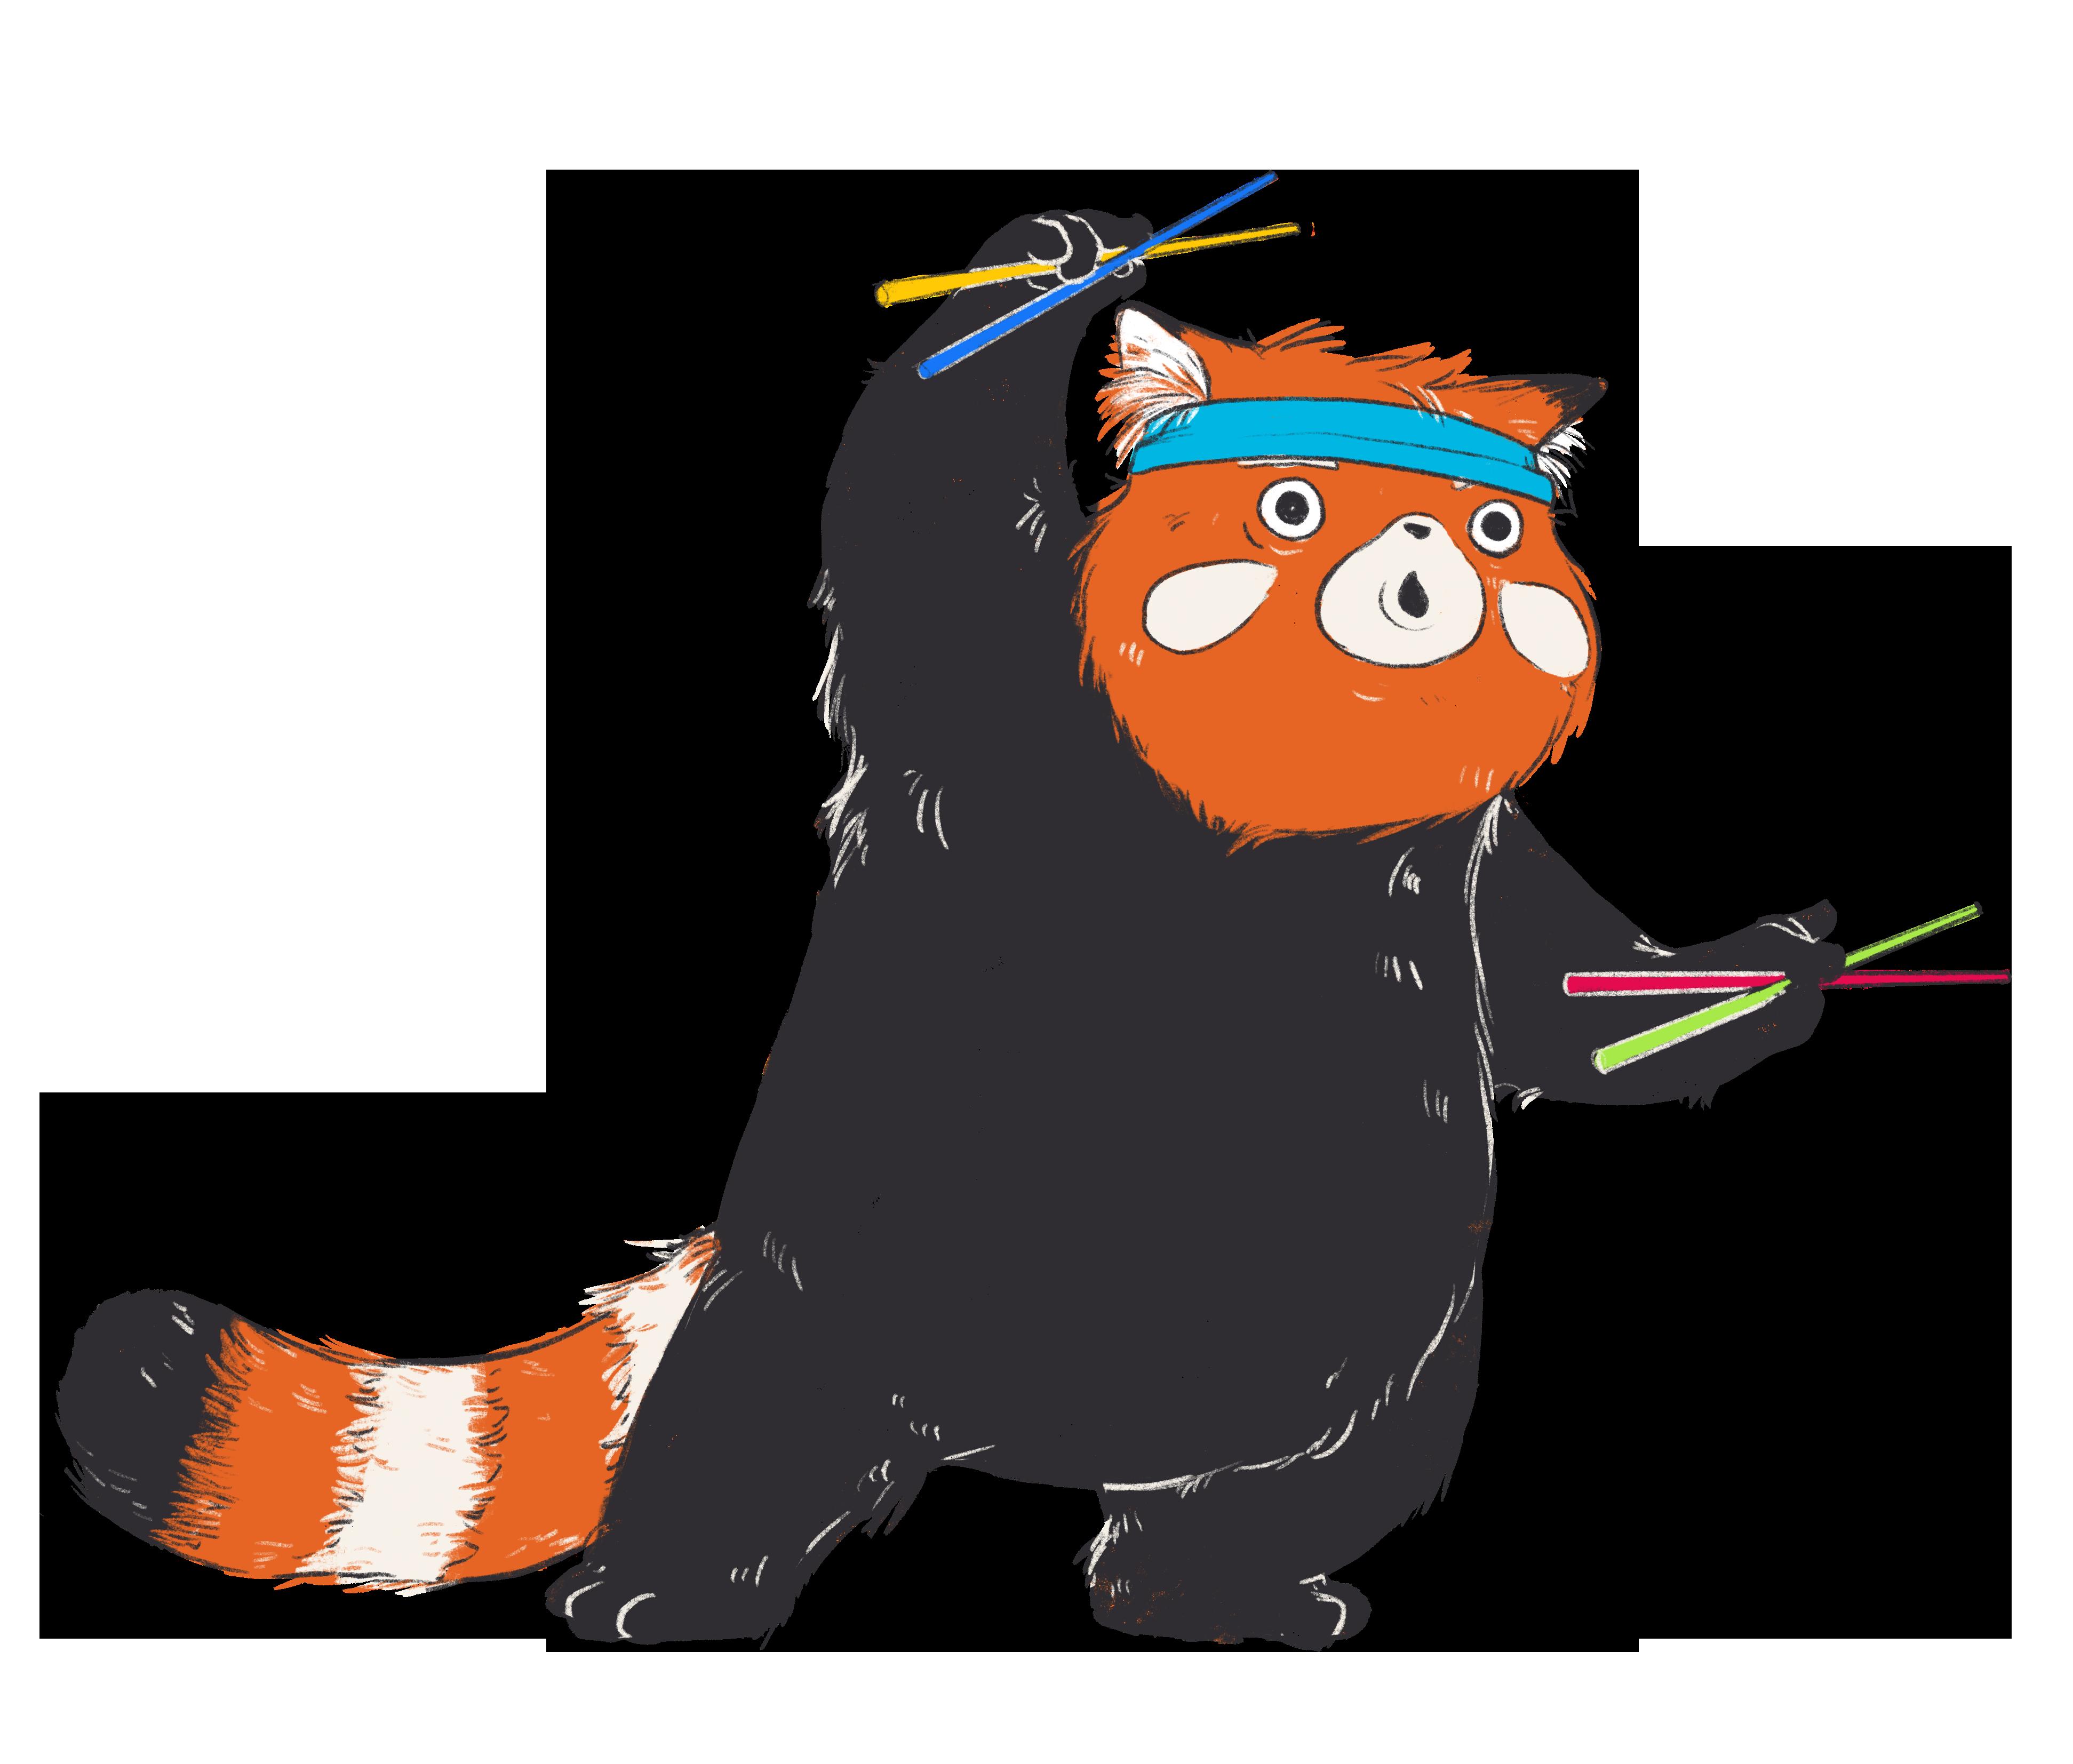 Stäbchen Karate Panda